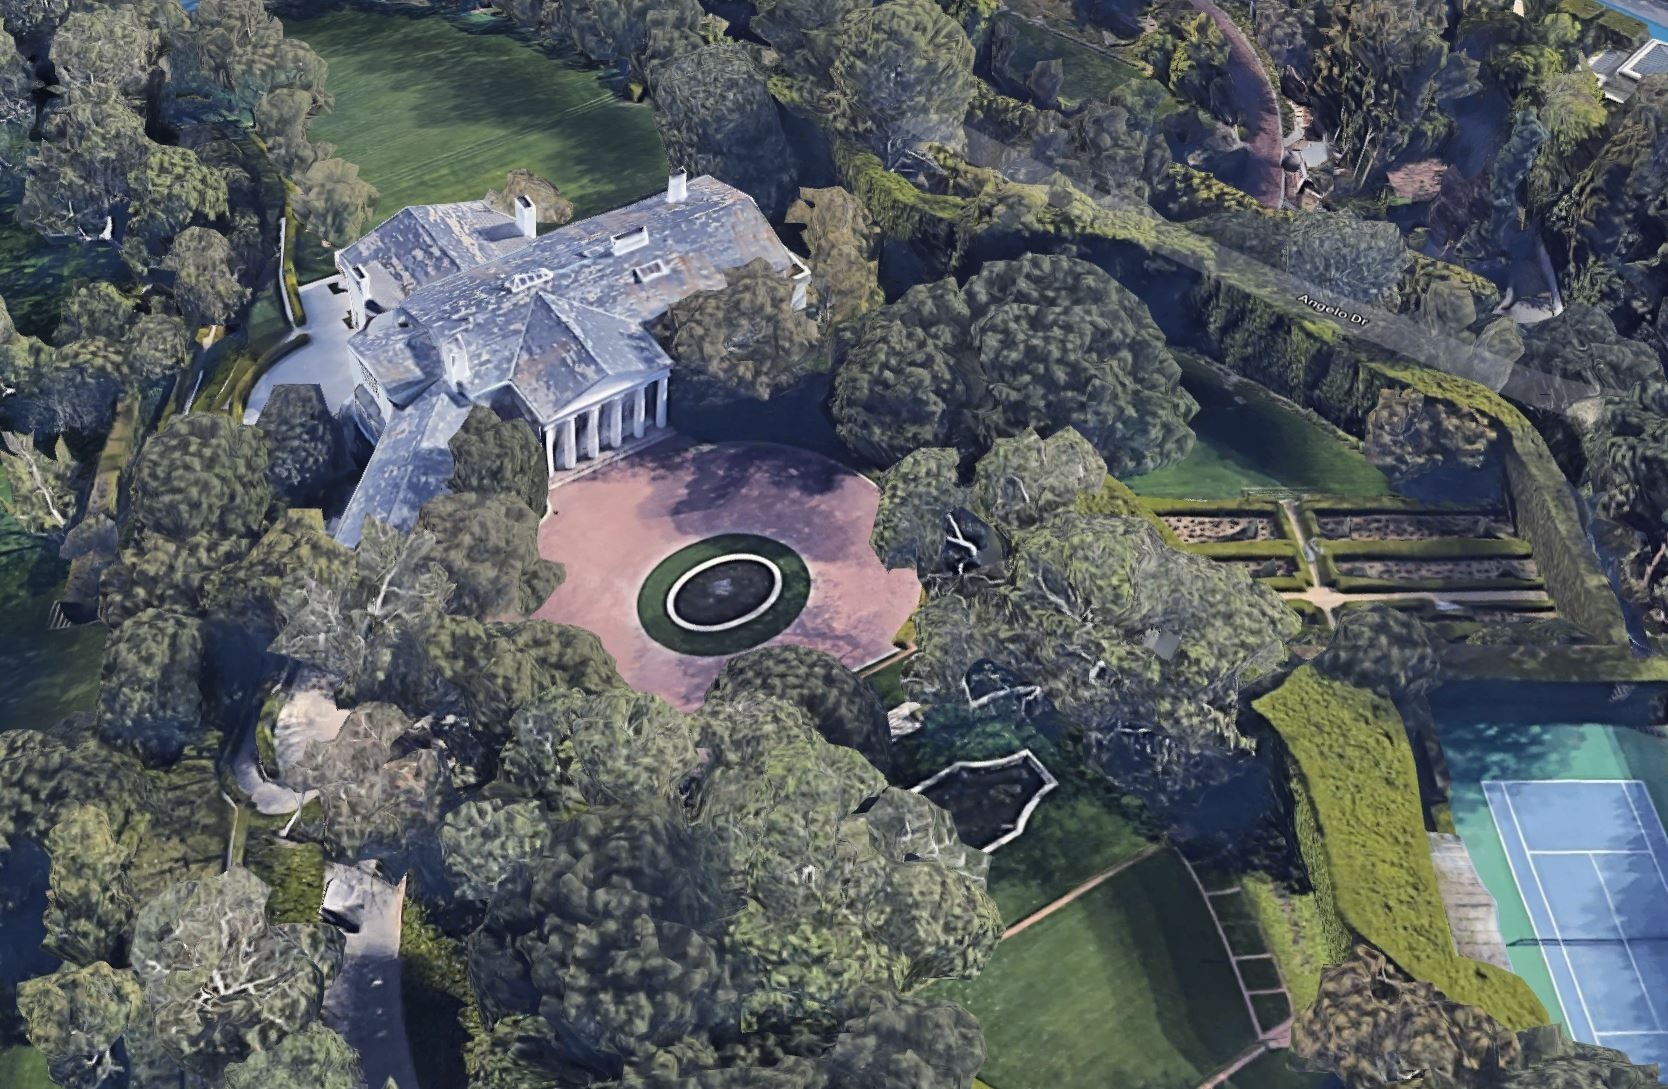 Jack Warner Estate/Jeff Bezos' house